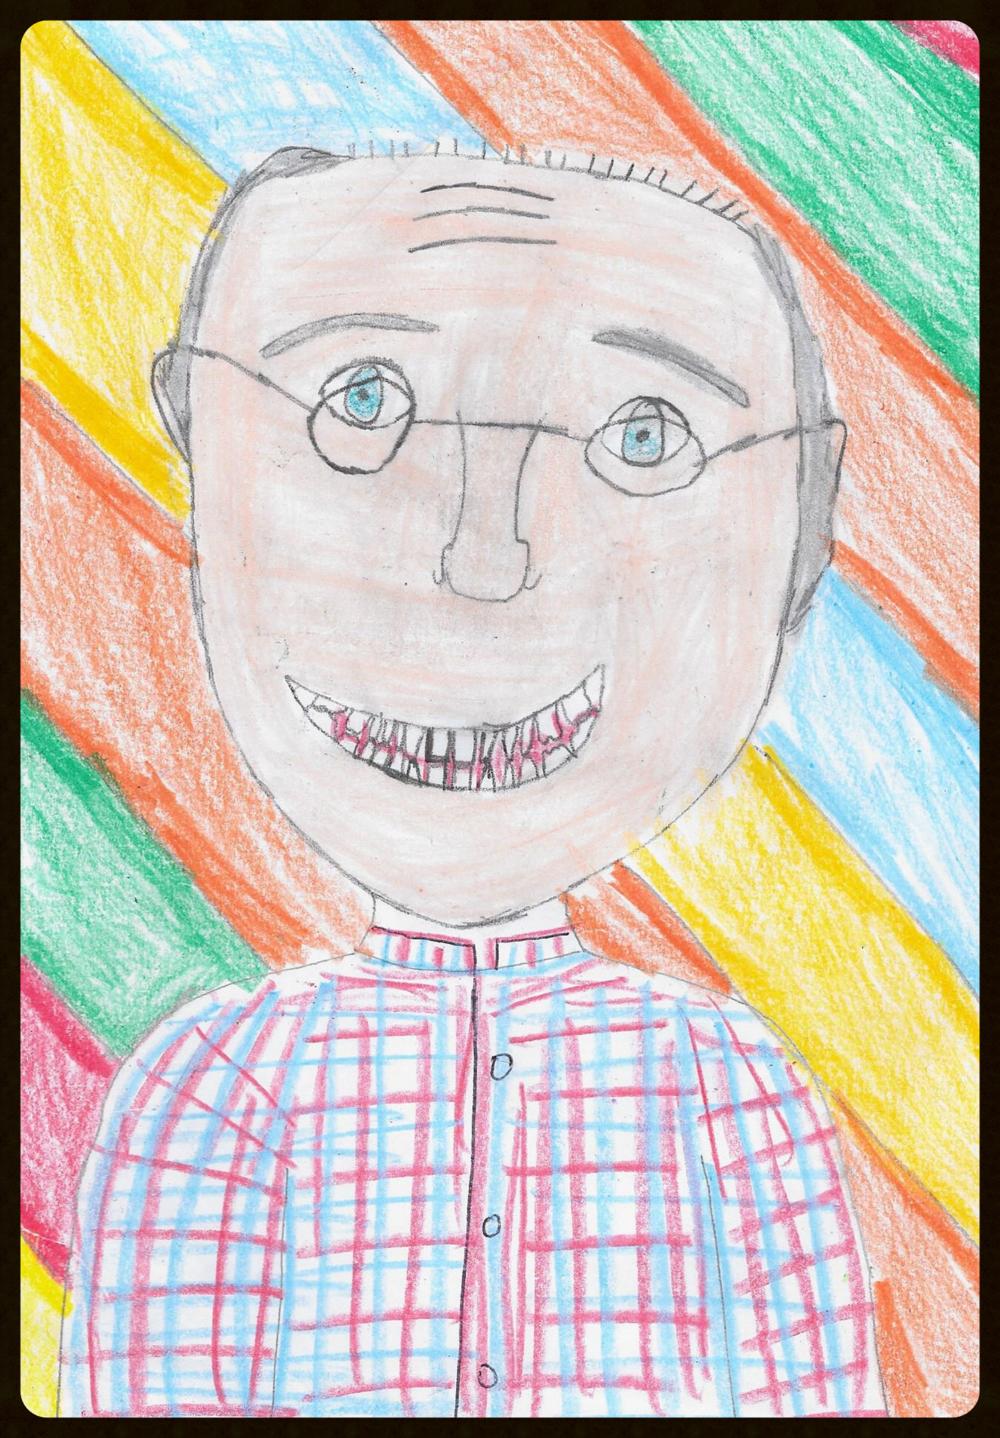 Joe McCann - School Caretaker